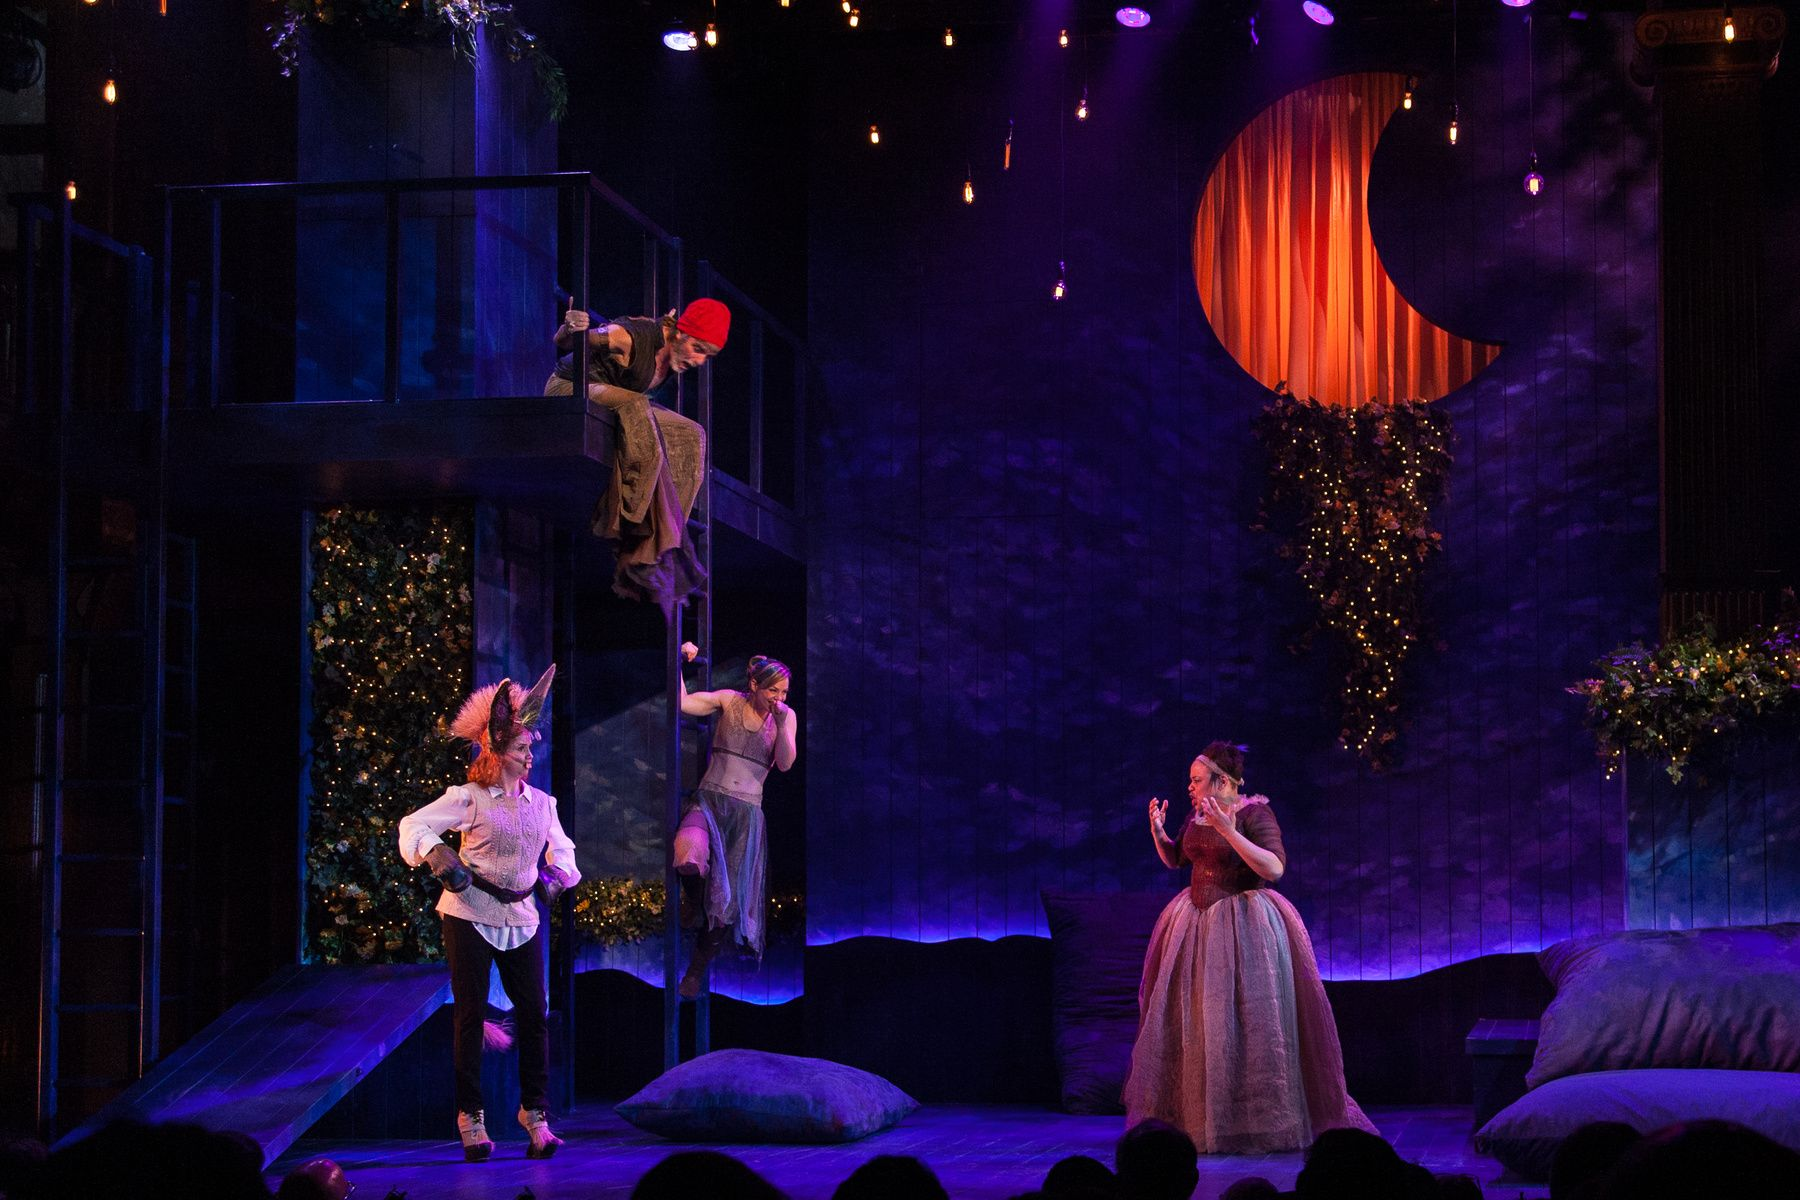 Midsummer Night s Dream Paige Hathaway Set Design